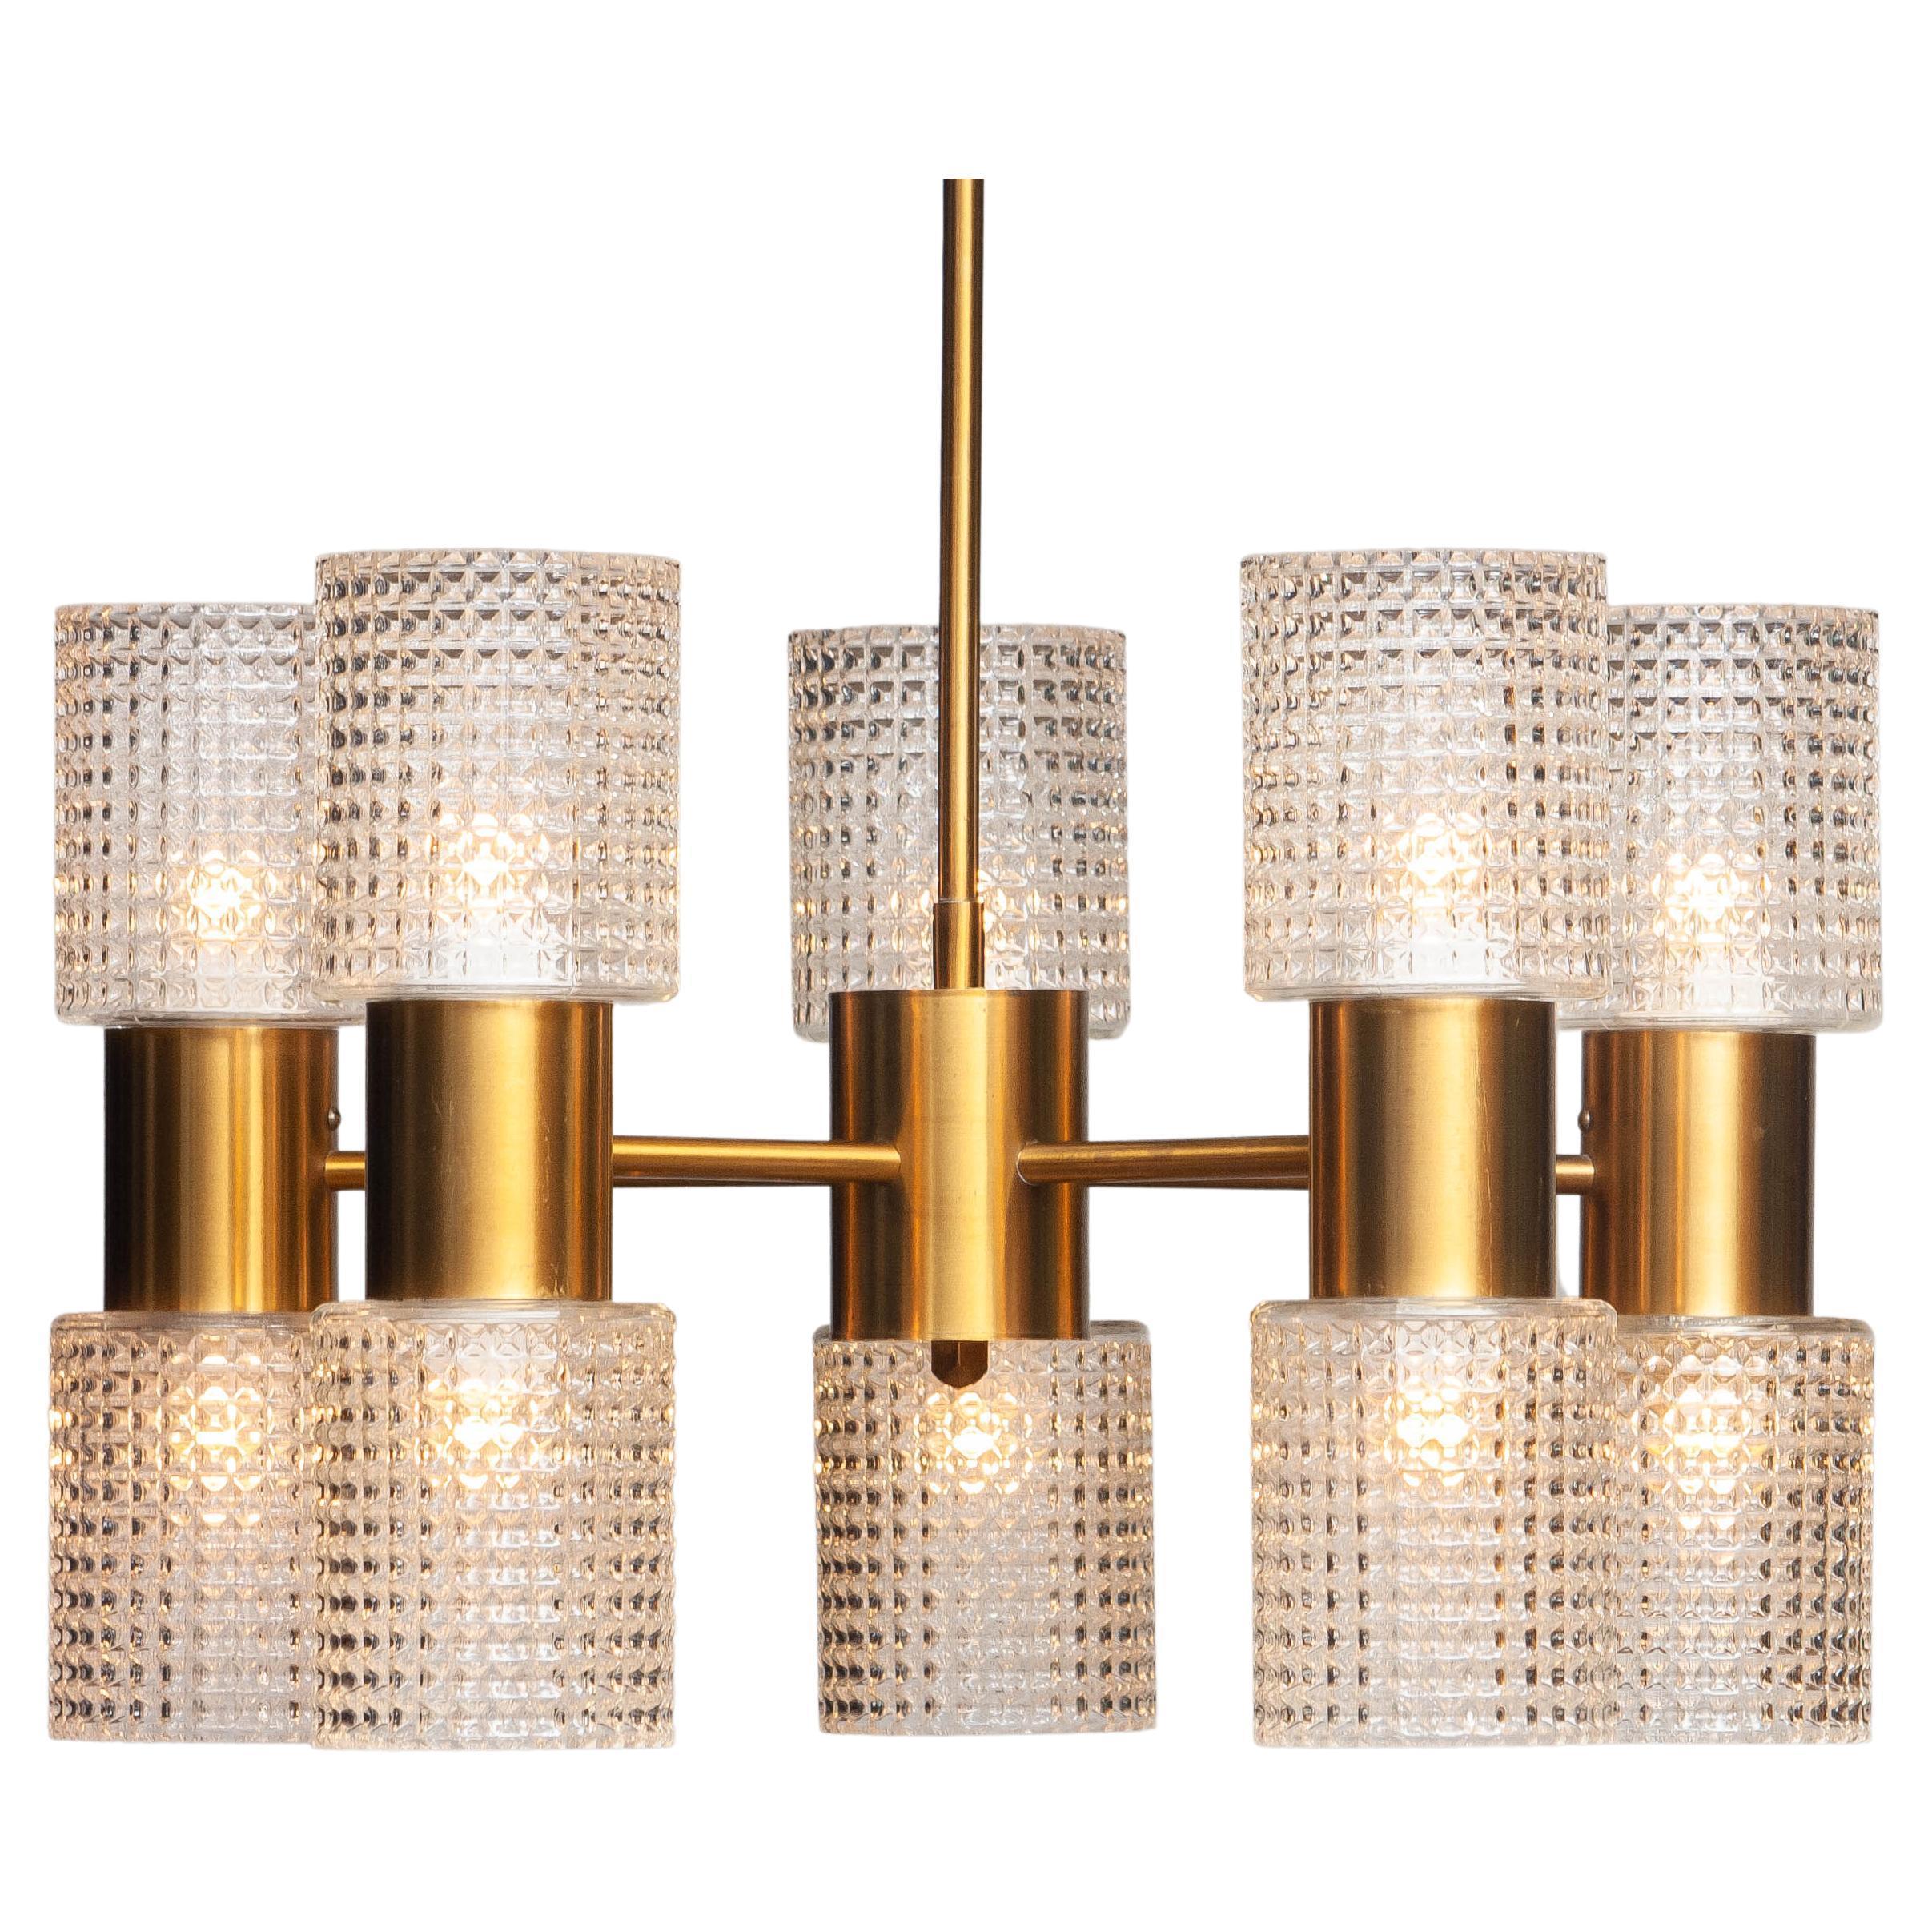 1960's Brass Glass Up and Down Light Chandelier by Konsthantverk Tyringe, Sweden